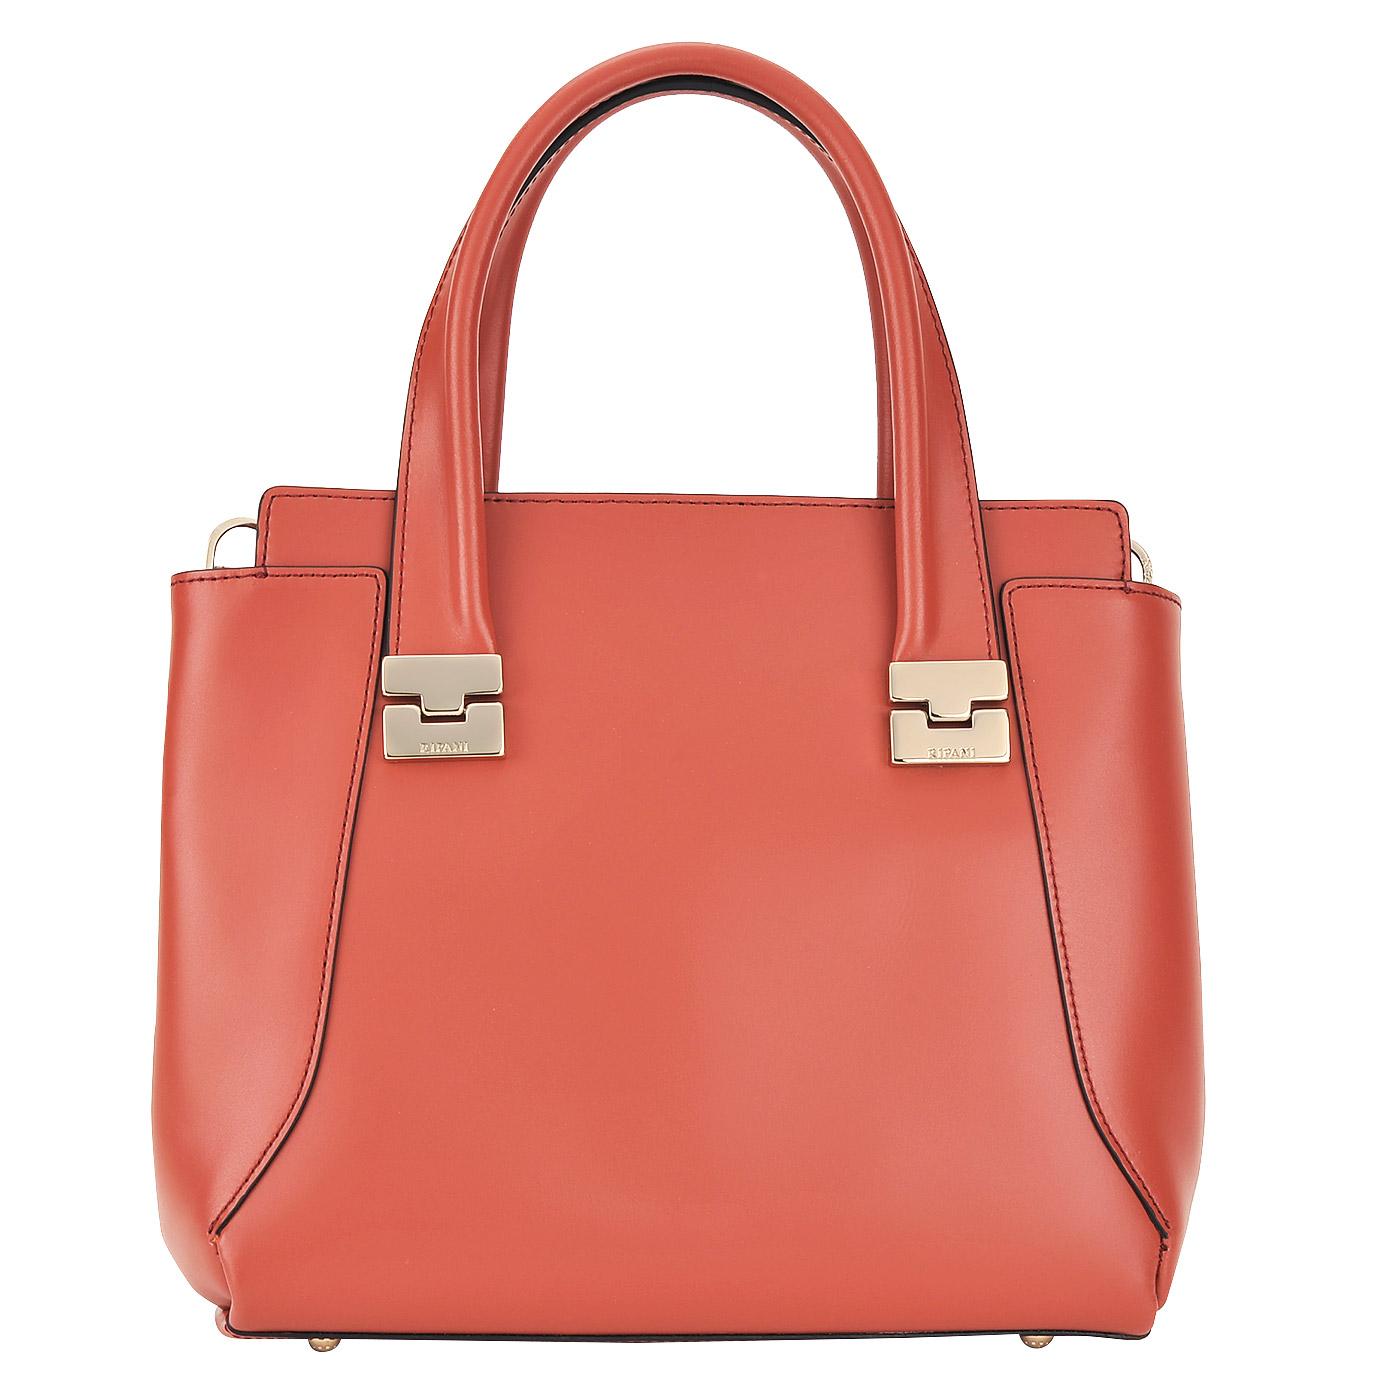 СумкаКлассические сумки<br>Ripani, Rodonite, сумка жен, н/к, терракота<br>